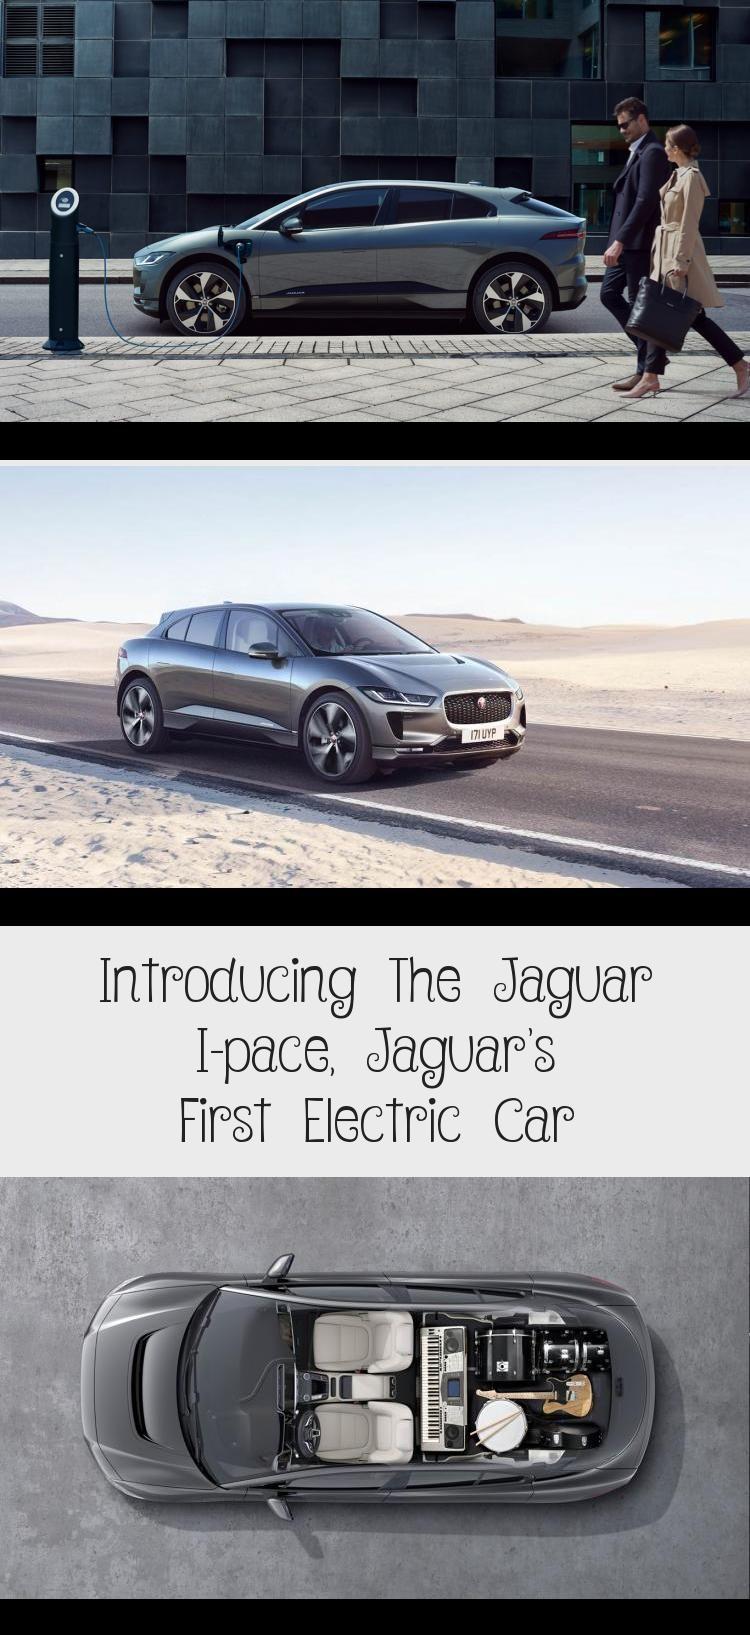 Introducing The Jaguar I Pace Jaguar S First Electric Car Technology In 2020 Jaguar Electric Car Car